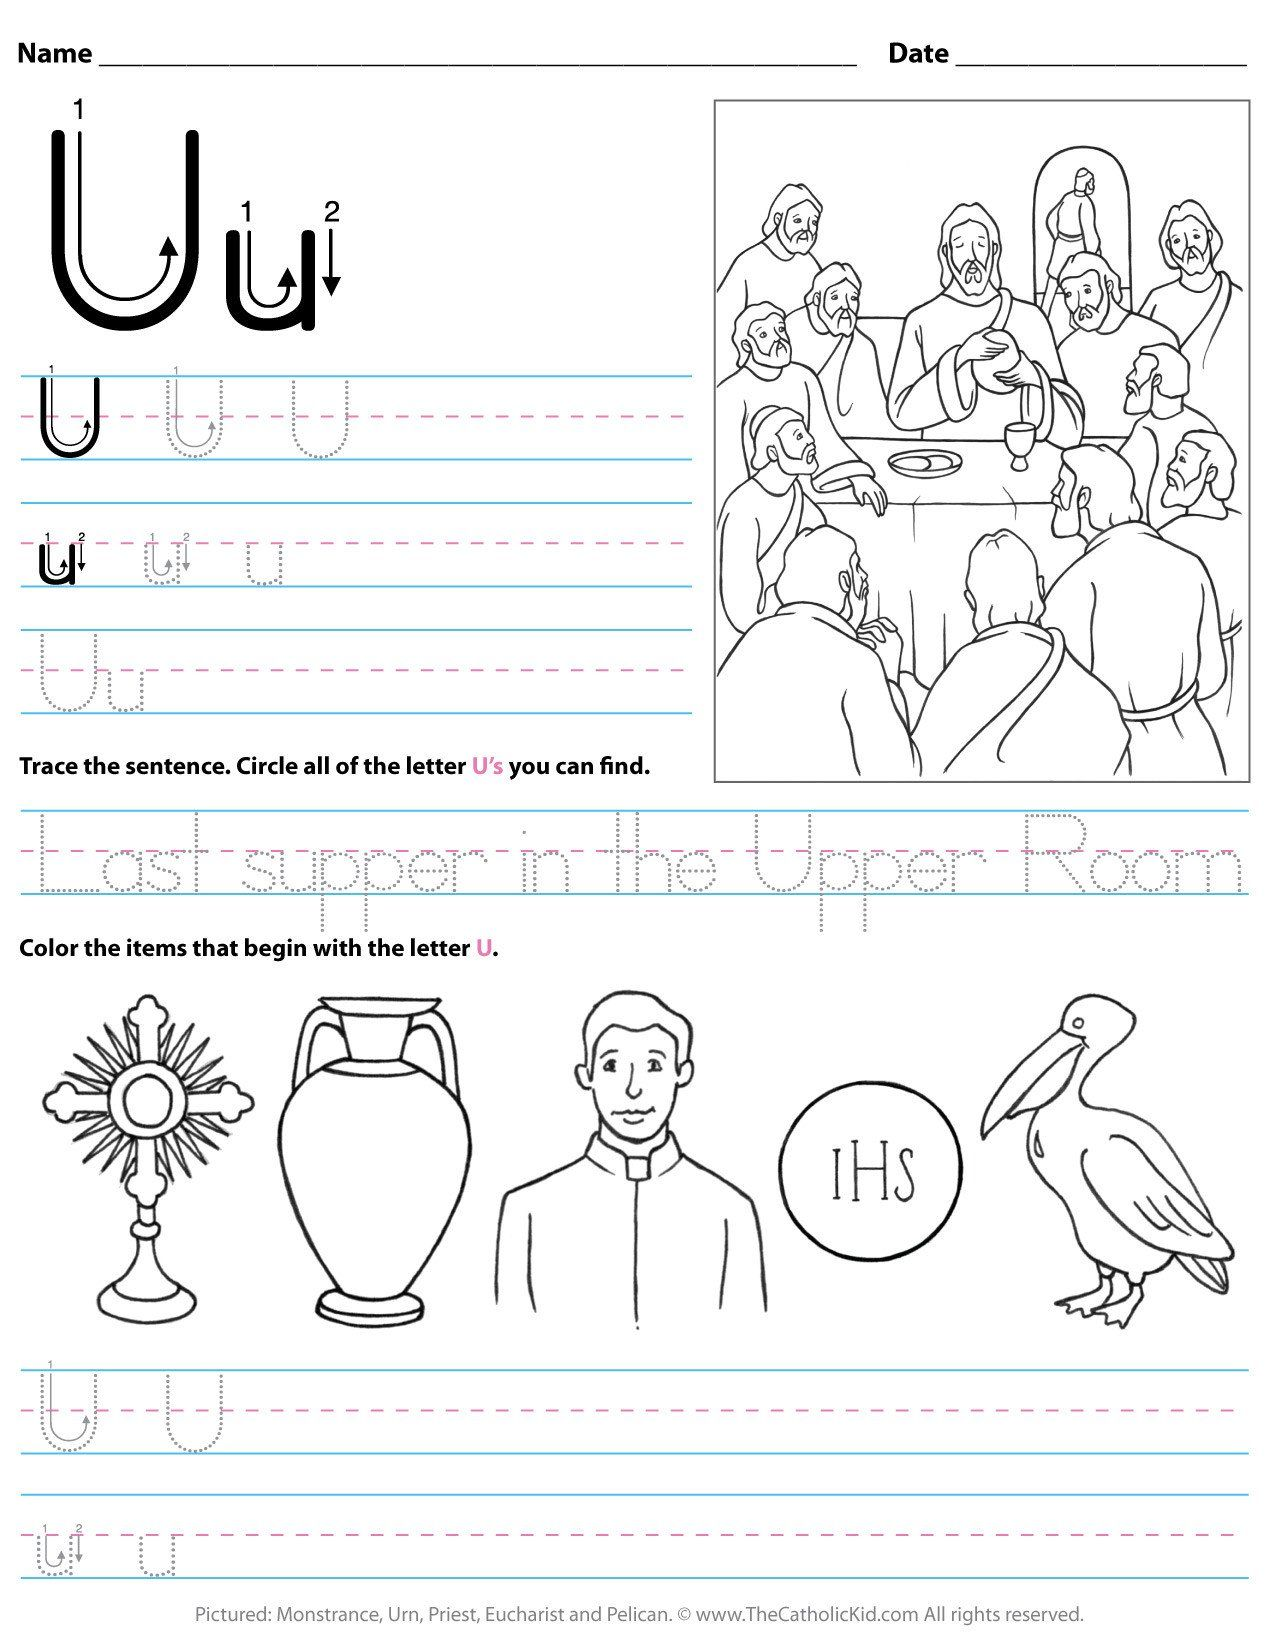 Letter U Worksheets For Kindergarten Catholic Alphabet Letter U Workshee In 2020 Kindergarten Worksheets Printable Preschool Worksheets Letter Worksheets For Preschool